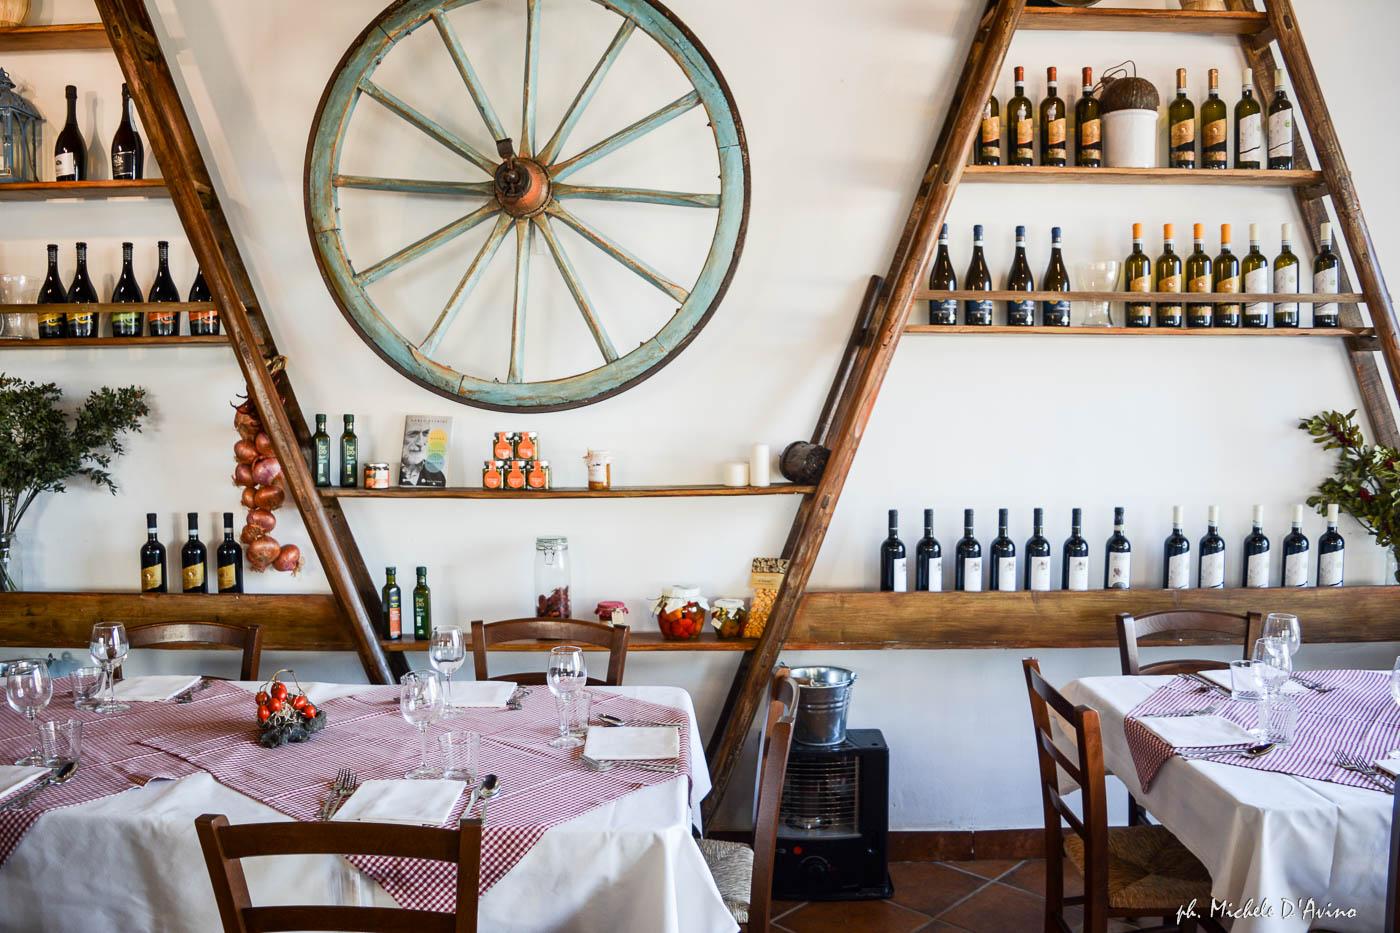 osteria-summa-terra-baccala-food-experience--13